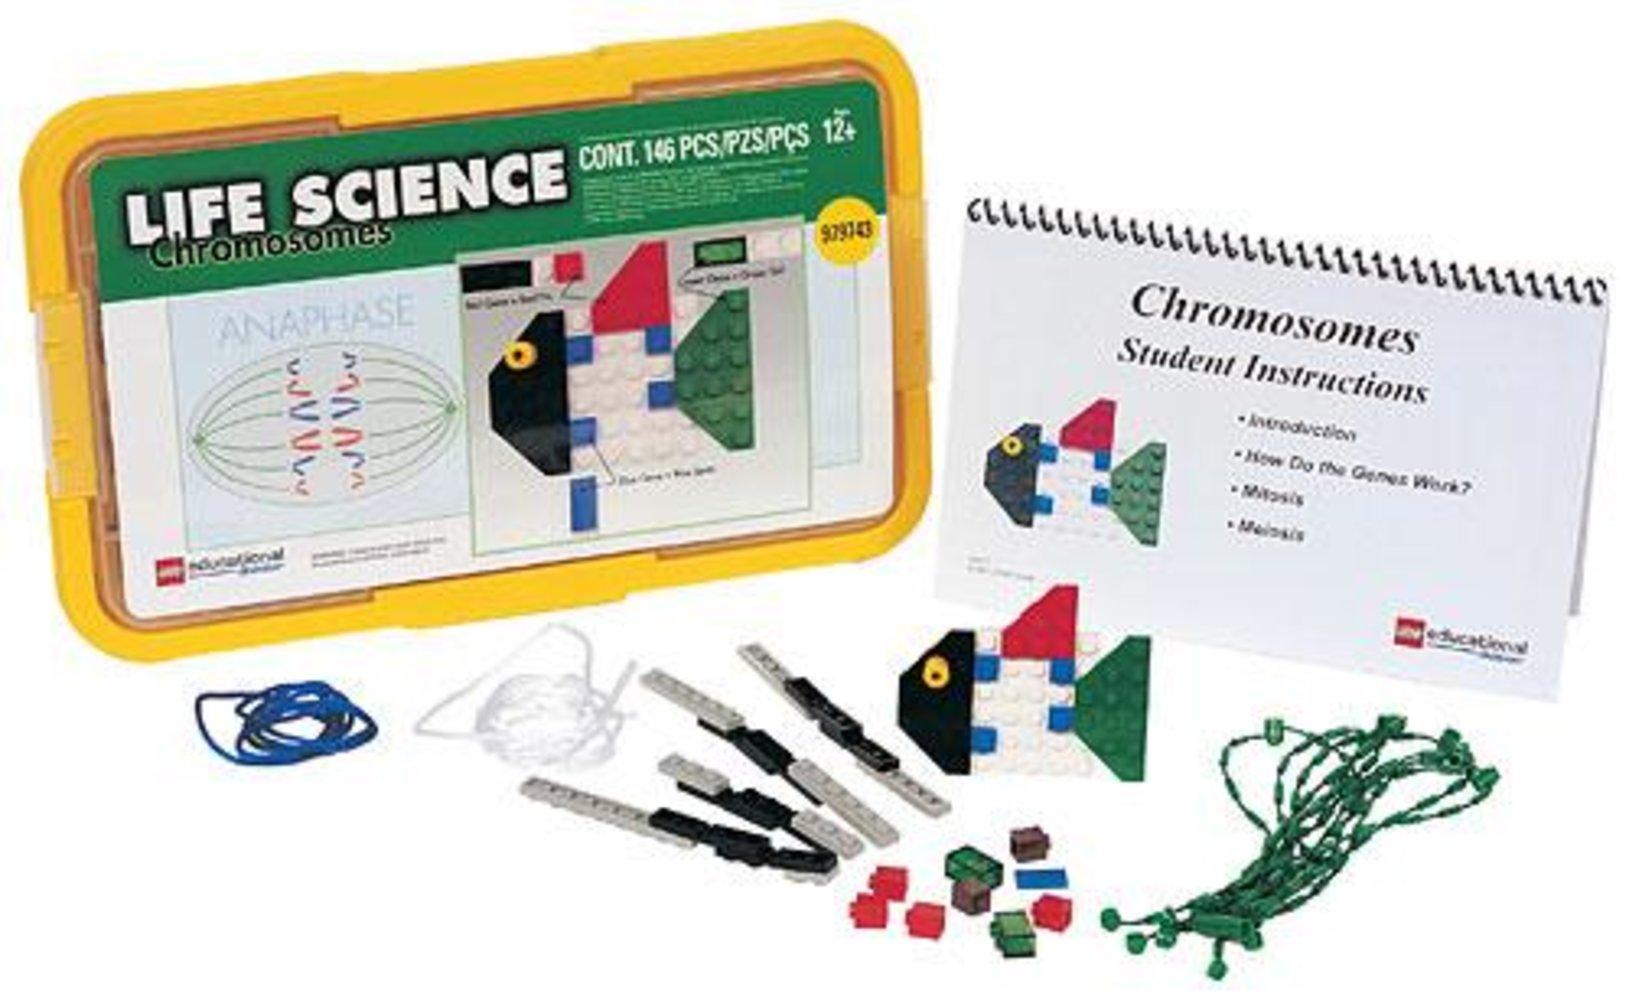 Chromosomes - Student Set